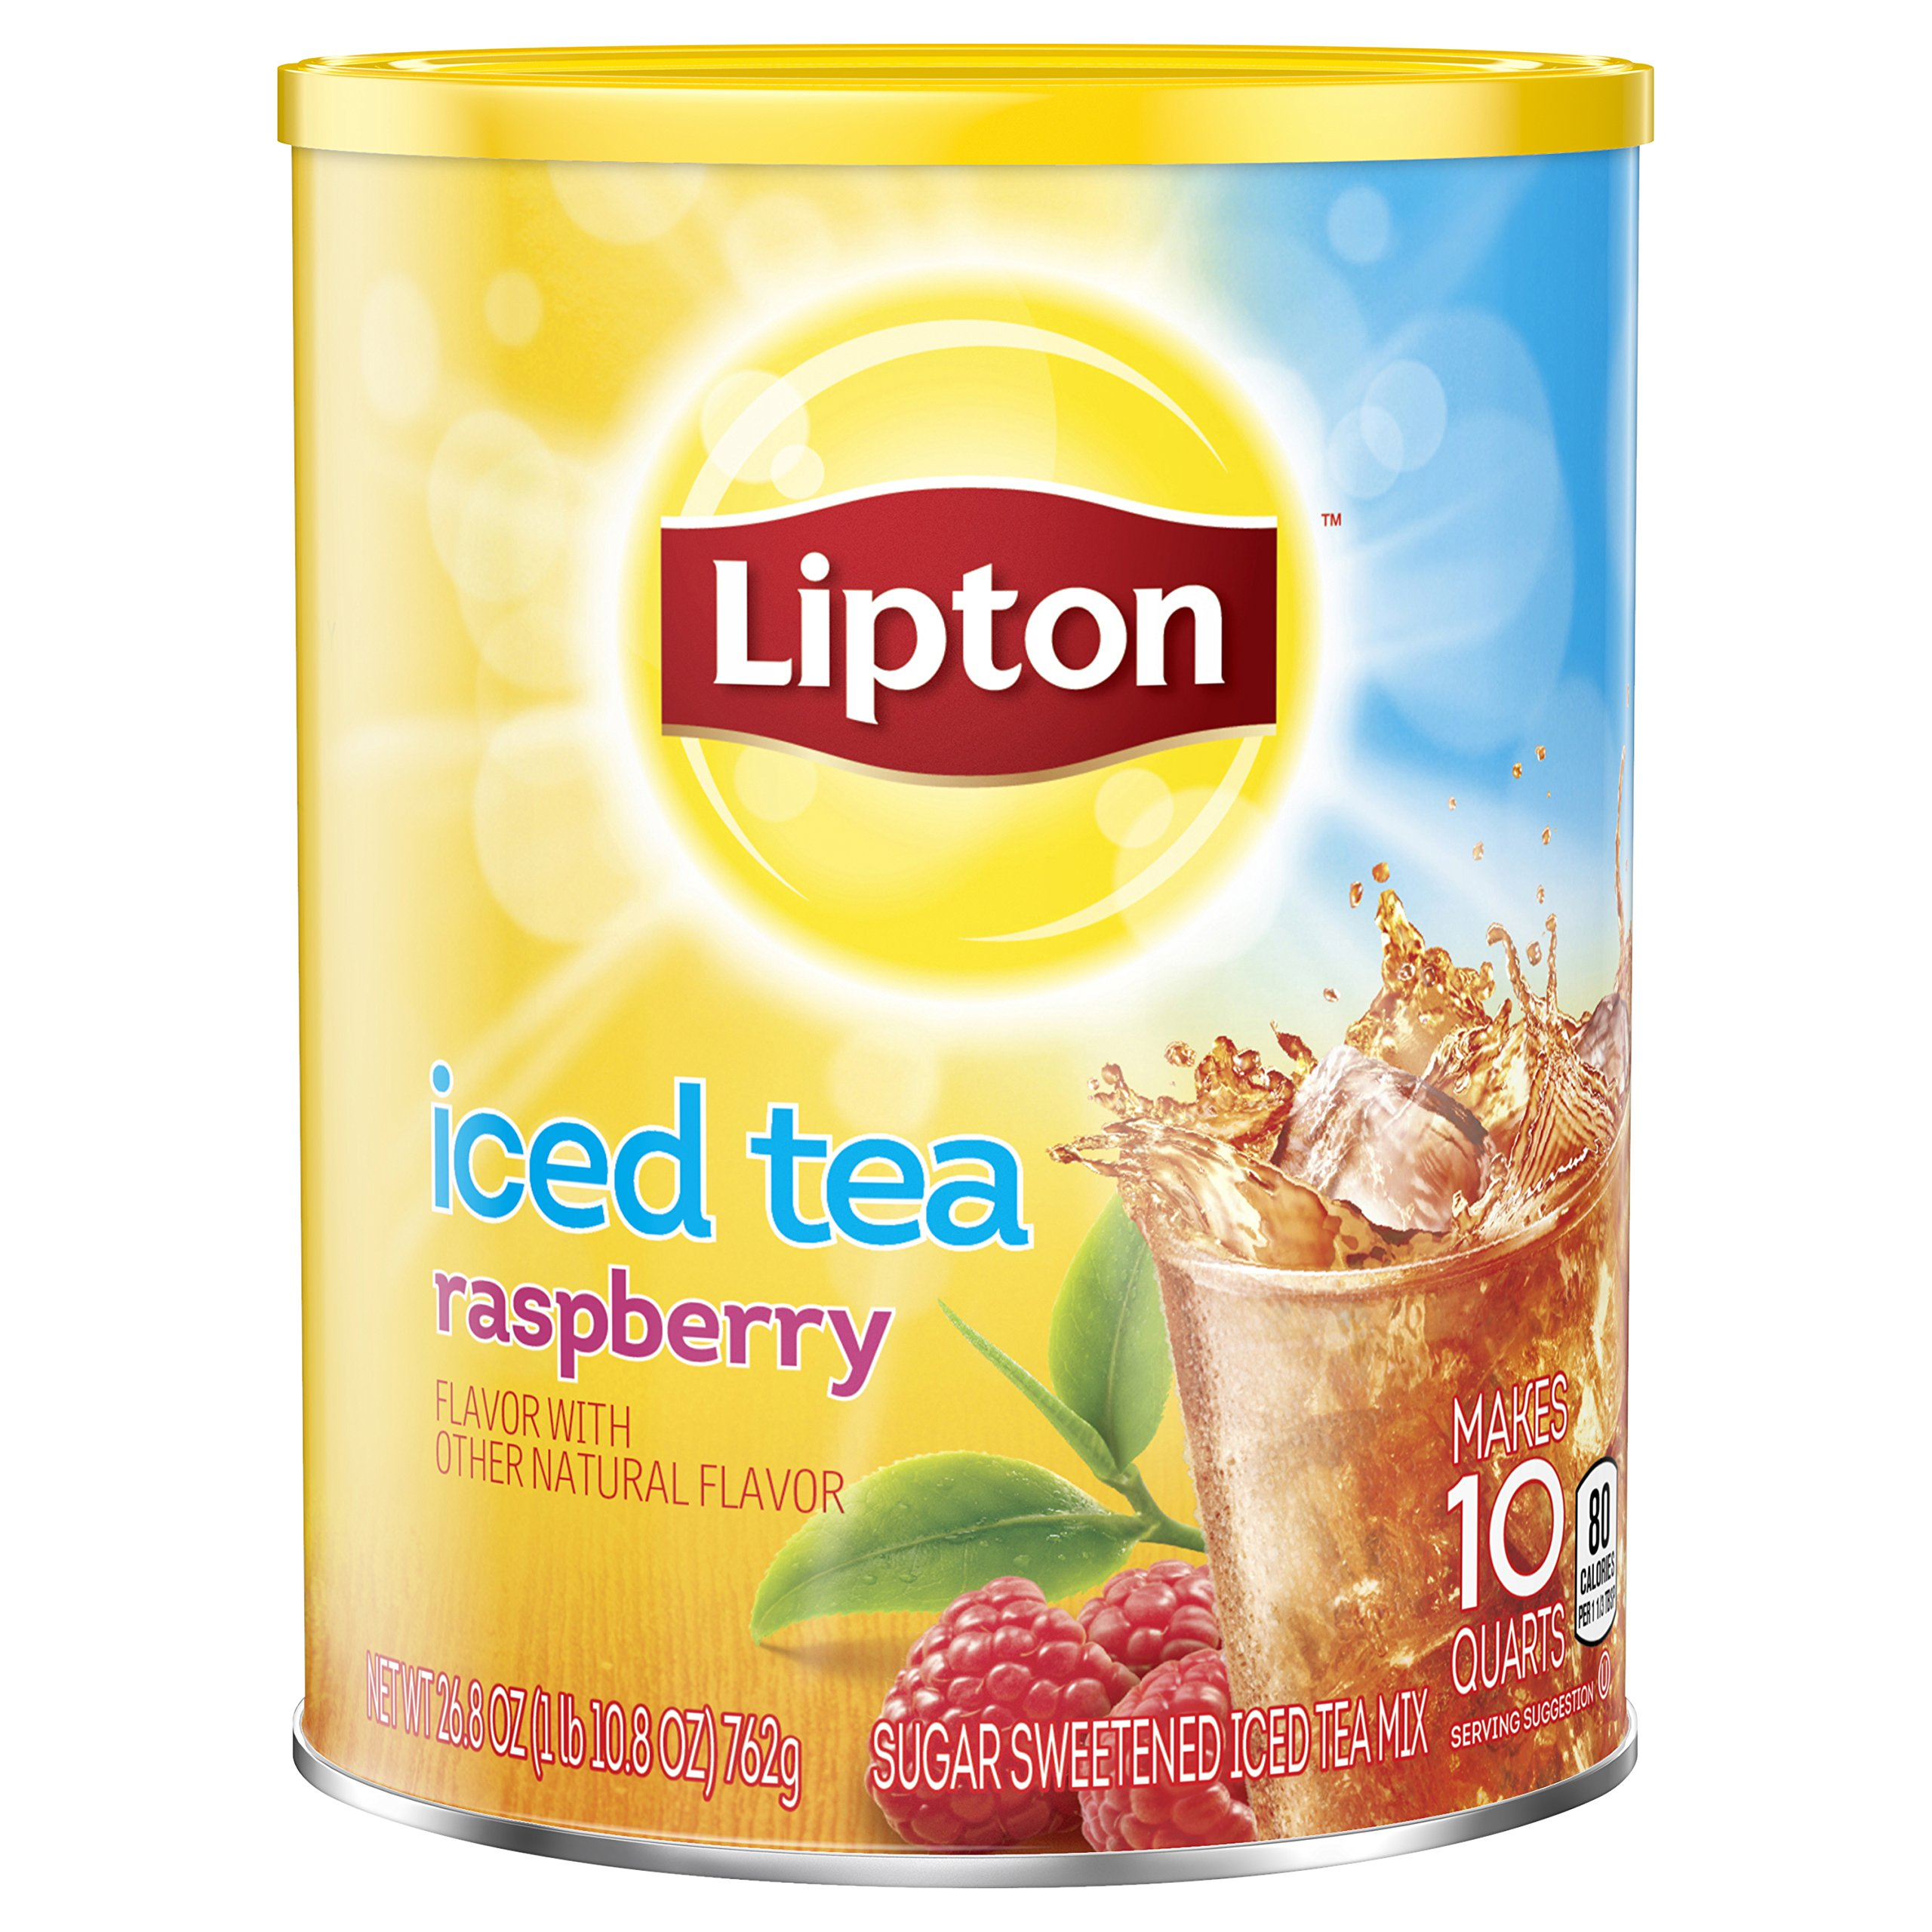 Lipton Iced Tea Mix, Raspberry 10 qt, (Pack of 6)